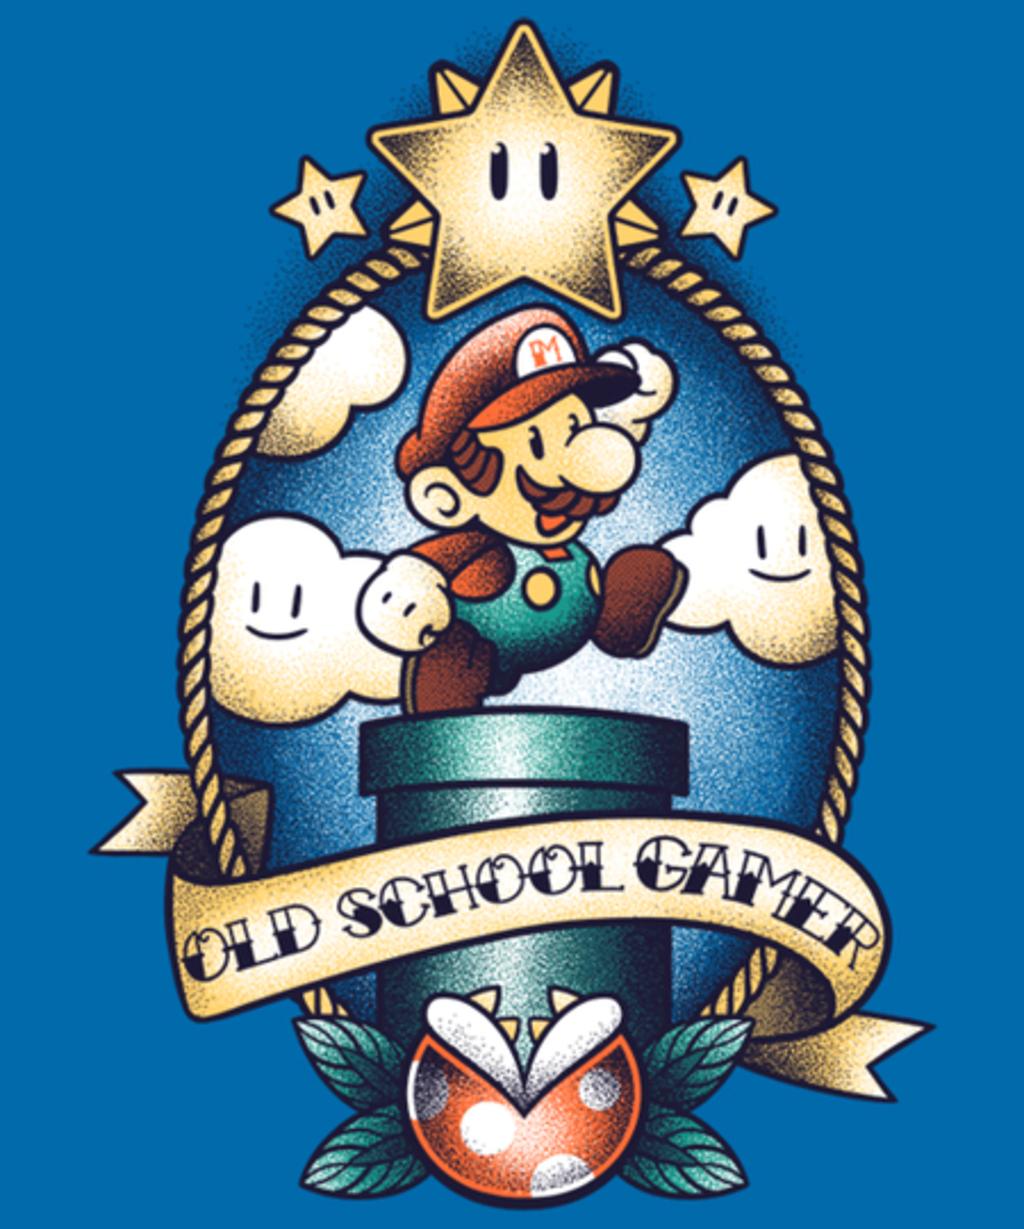 Qwertee: Super old school gamer